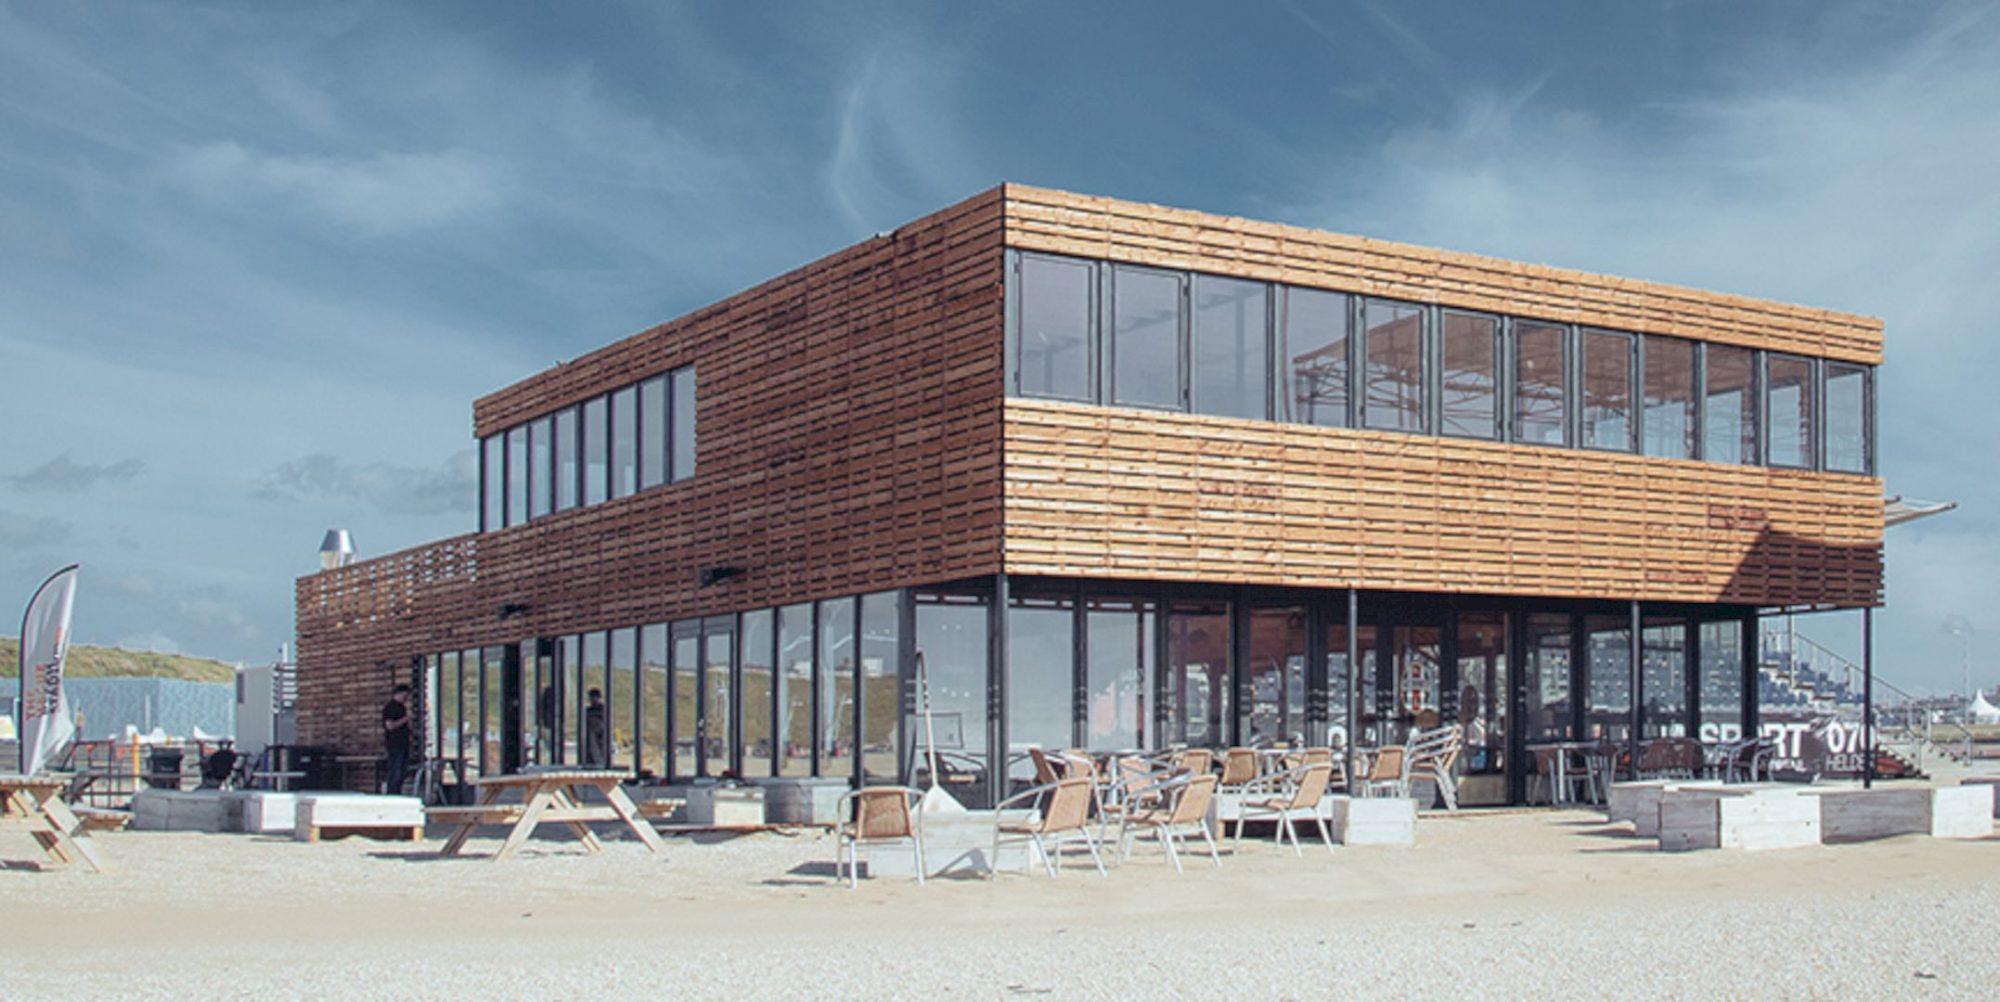 Beach Pavilion: A Brand New Sports Pavilion for The Hague Beach Stadium